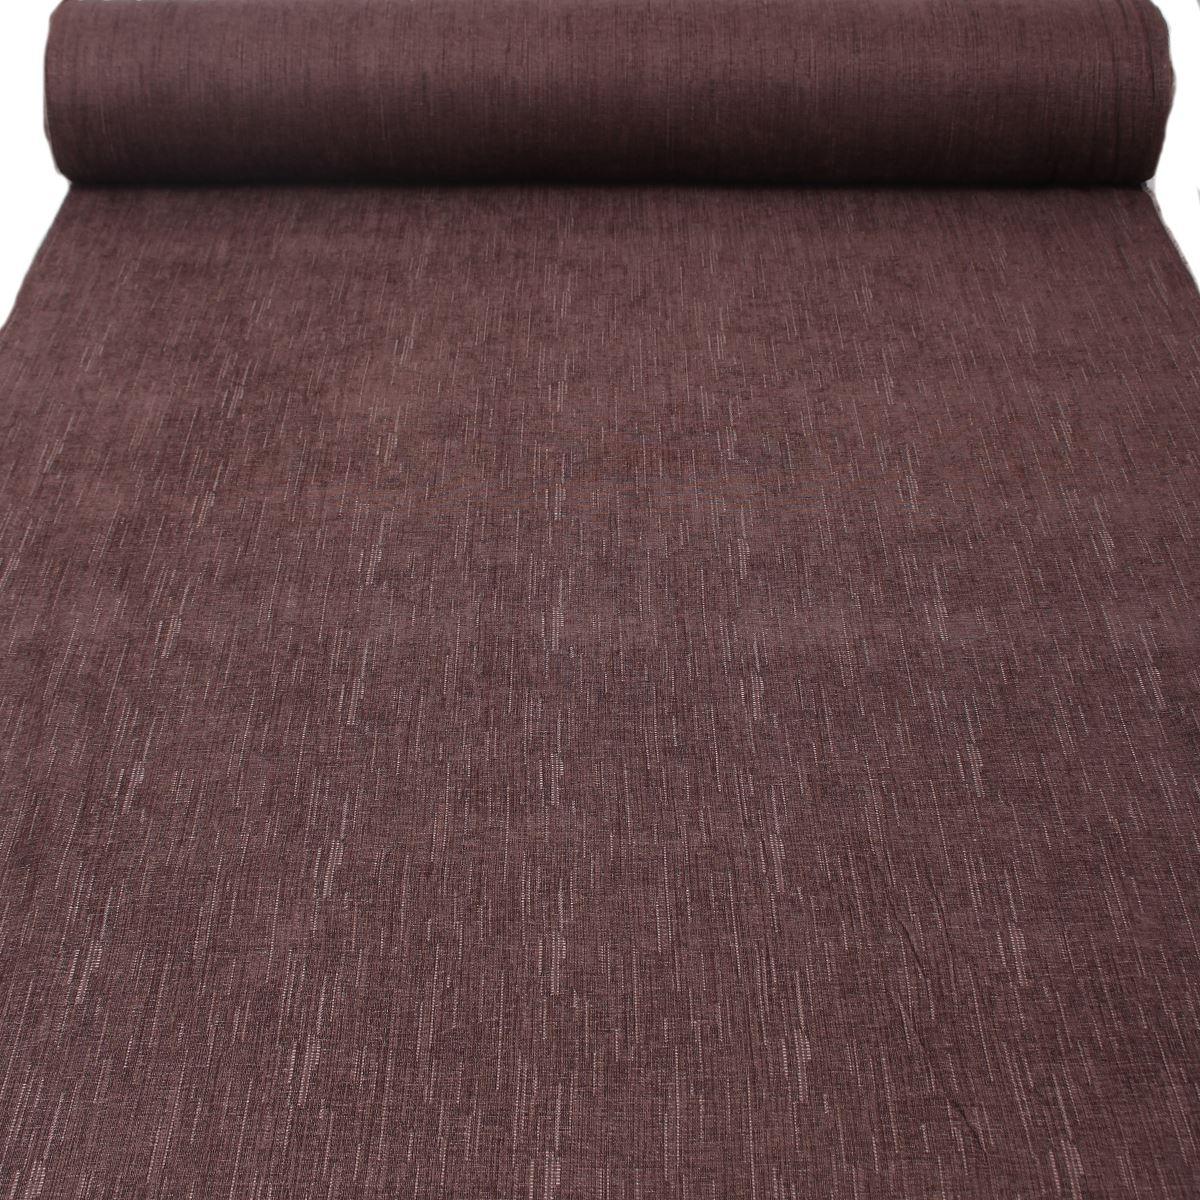 034-Chenille-034-Slubbed-Shabby-Worn-Look-Curtain-Cushion-Sofa-Upholstery-Fabric thumbnail 13